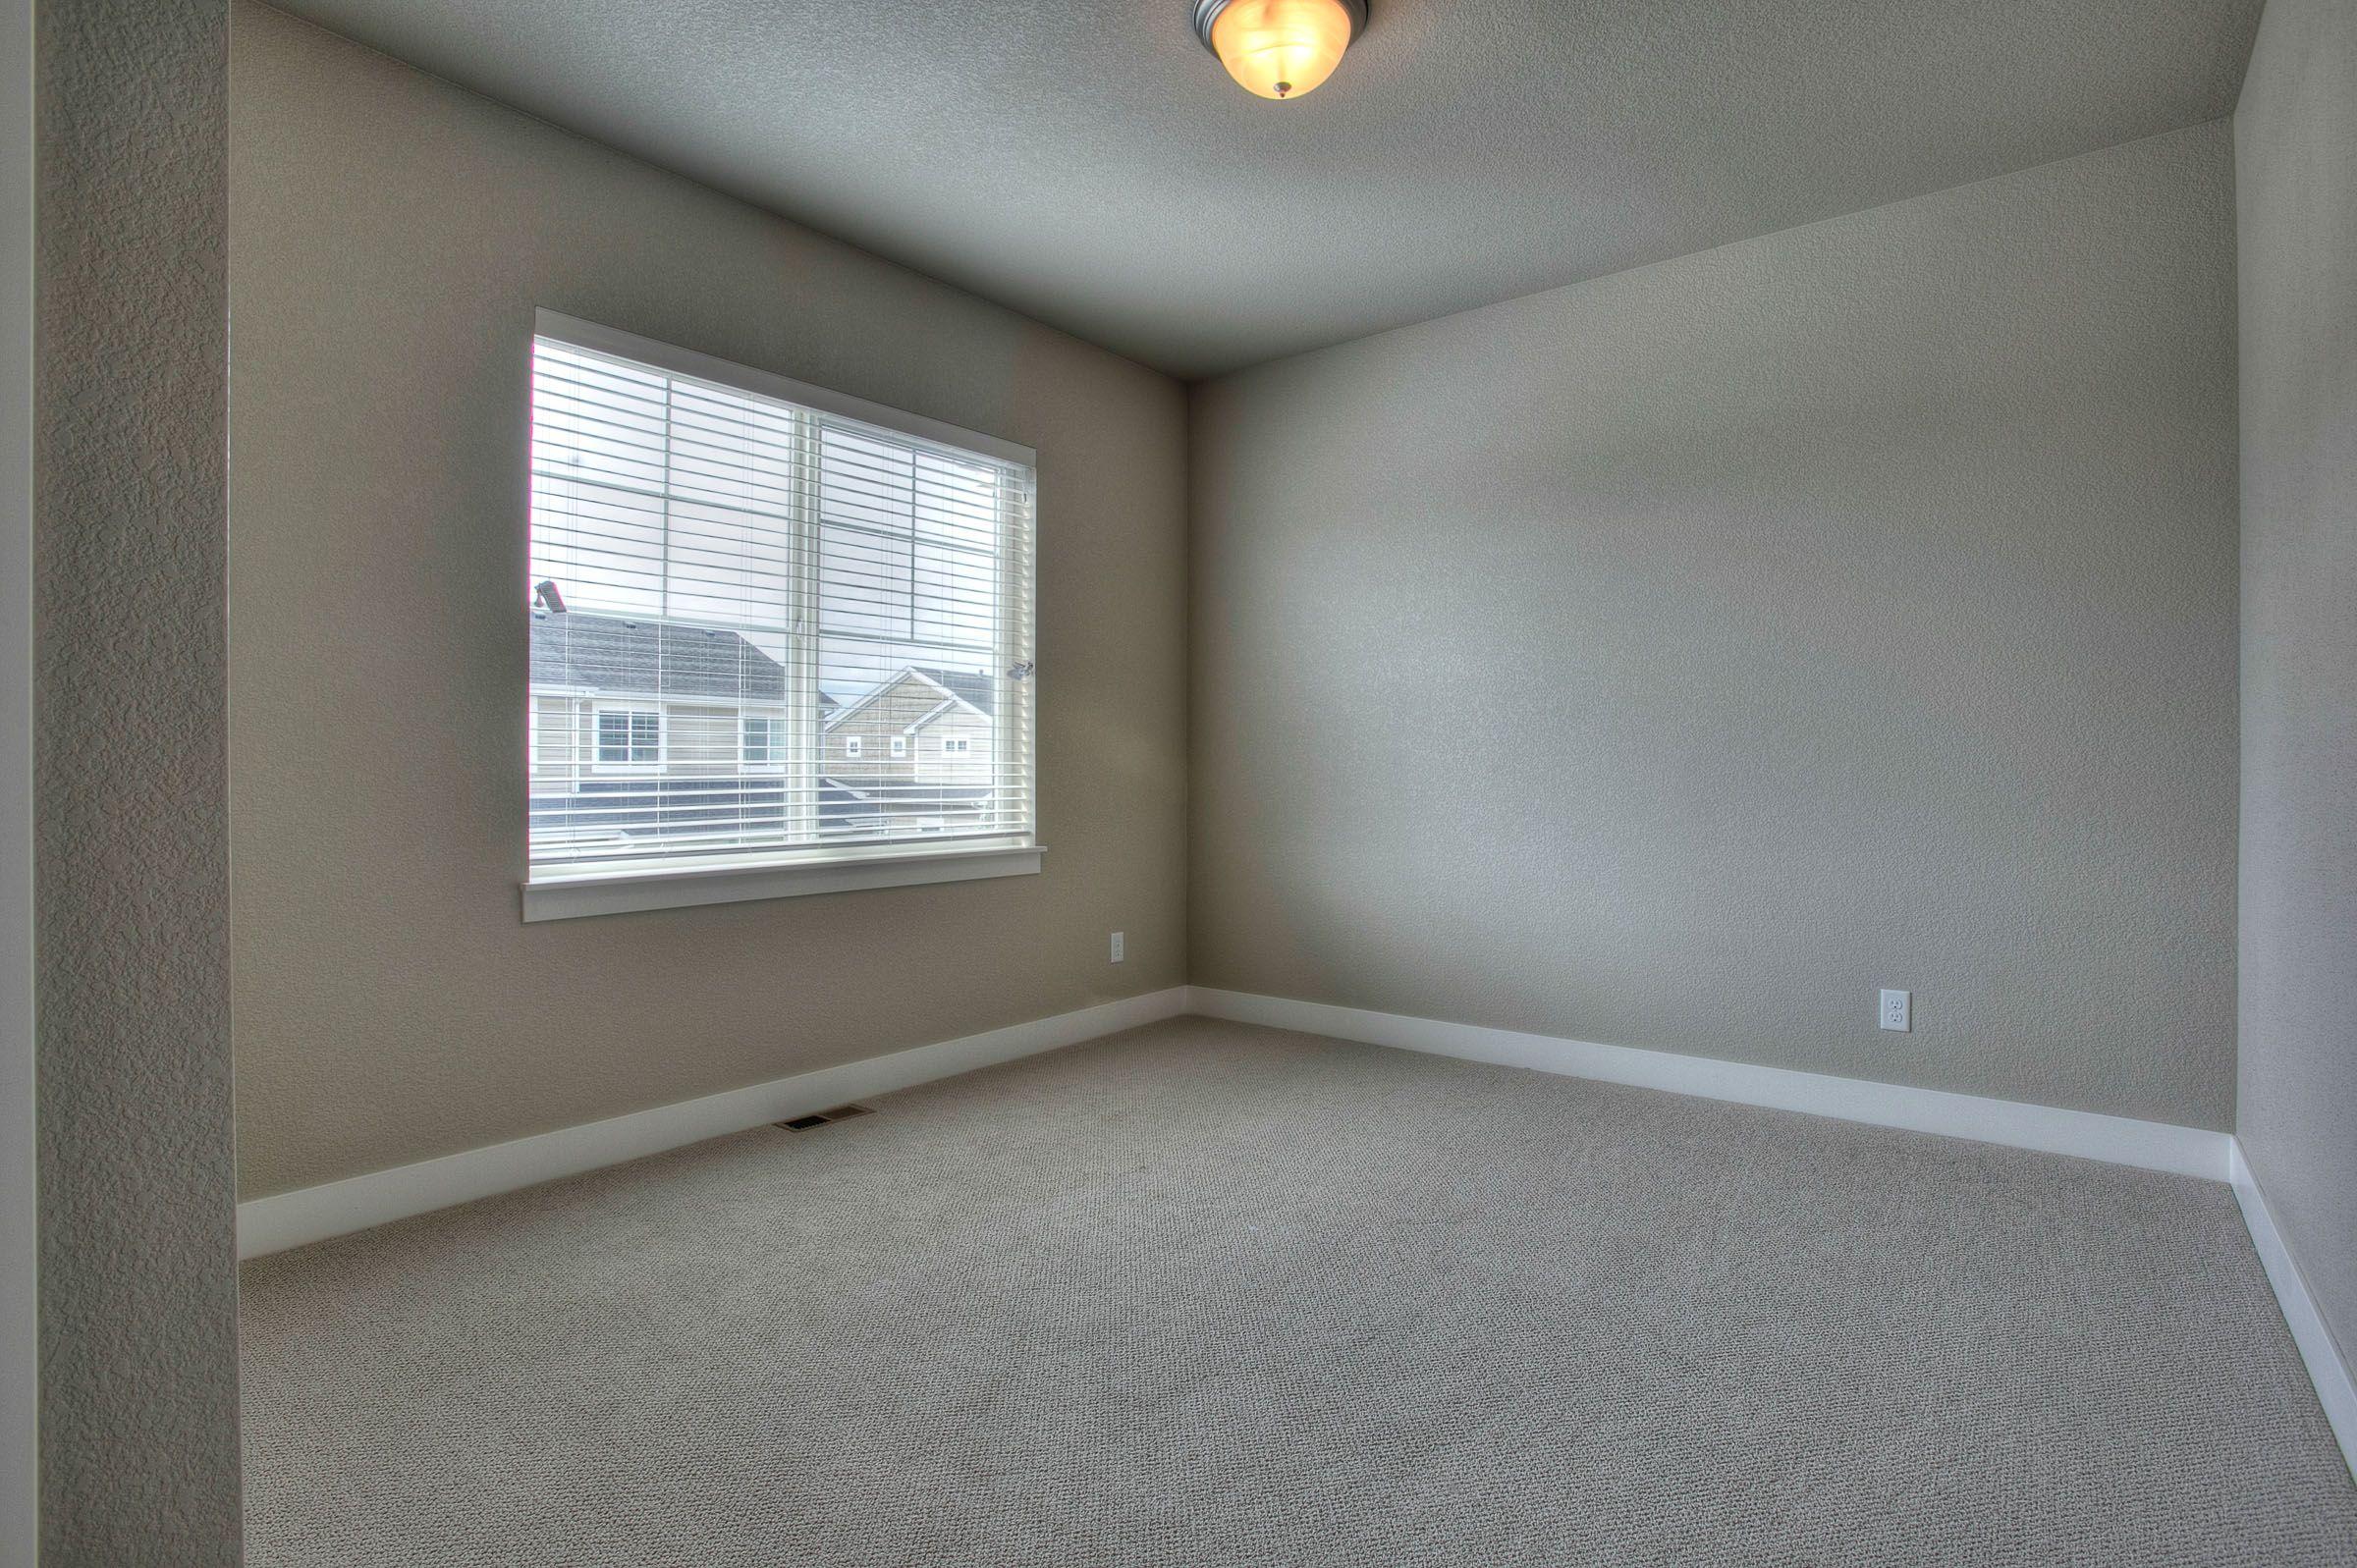 Benjamin Moore Hc172 Revere Pewter Carpet Avoca Soft Misty Morn House Rental New Homes New Home Designs